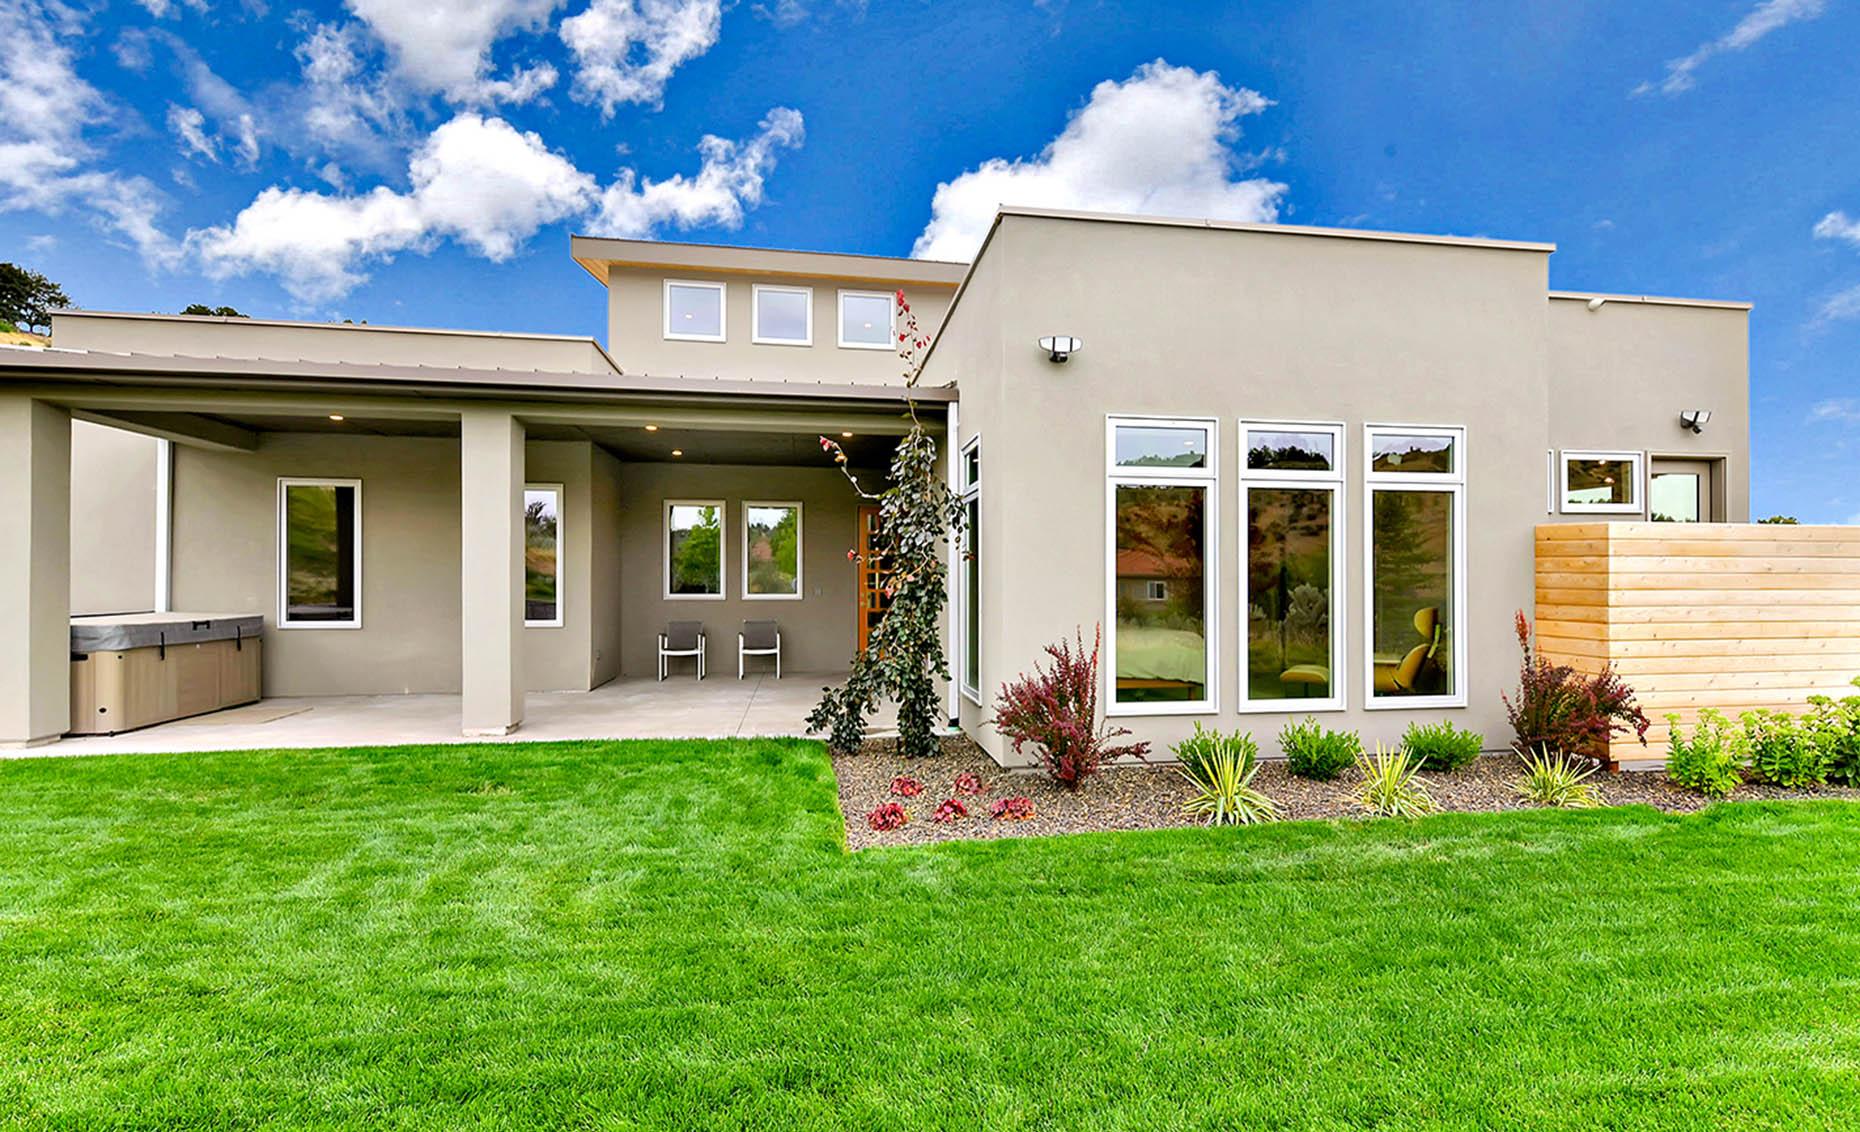 The Nature View Custom Home Backyard Exterior